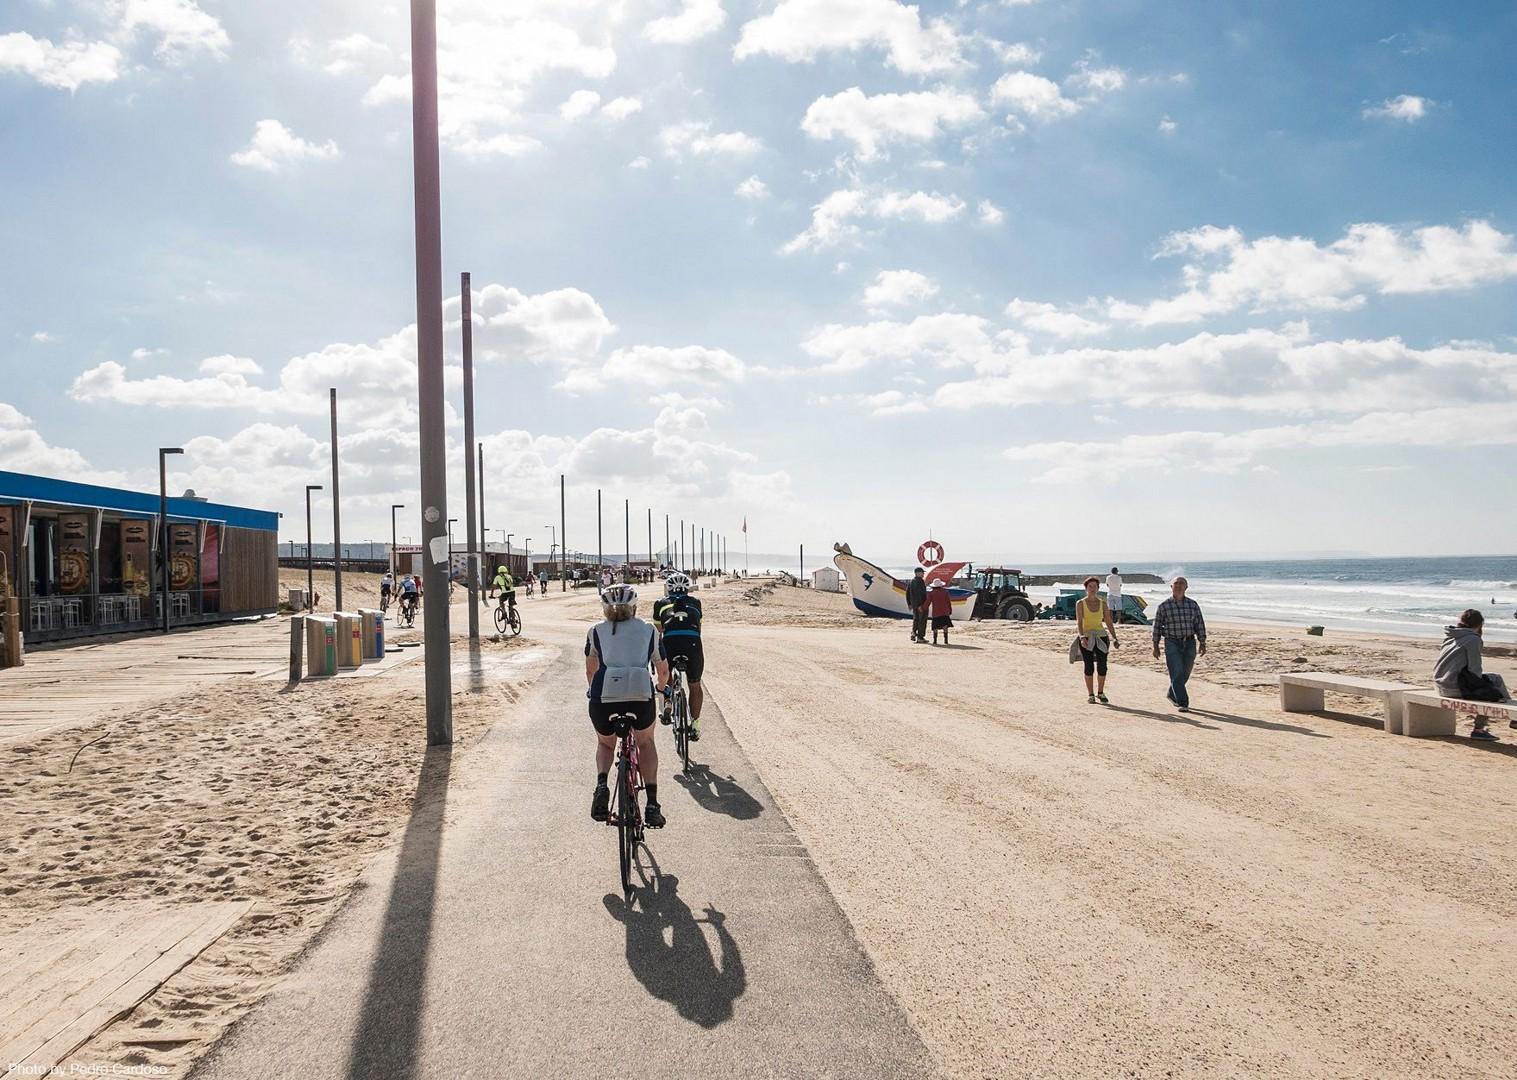 atlantic-escape-road-cycling-portugal.jpg - Portugal - Atlantic Escape - Guided Road Cycling Holiday - Road Cycling